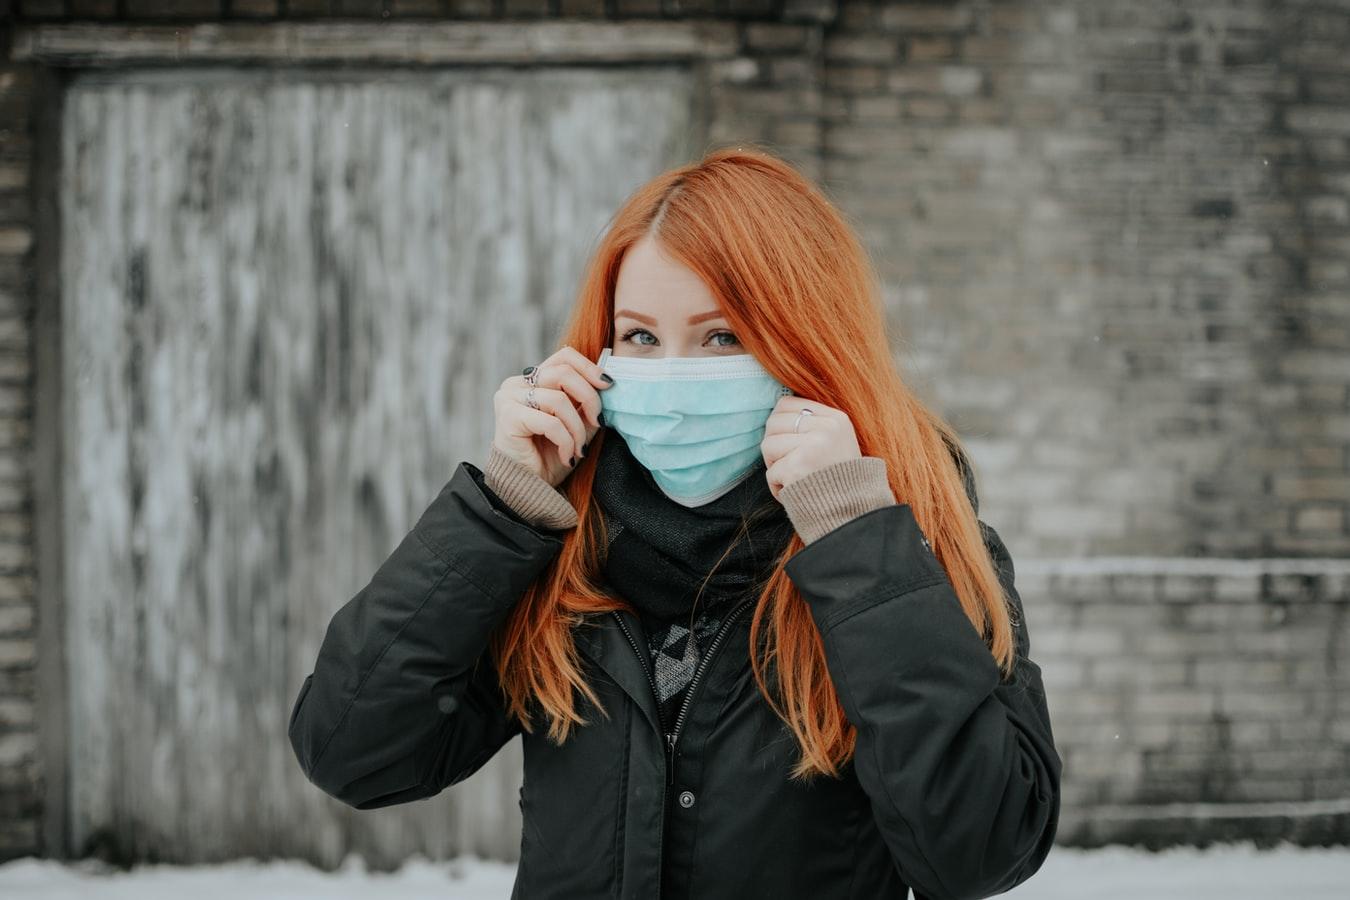 Donna coi capelli rossi mentre indossa una mascherina